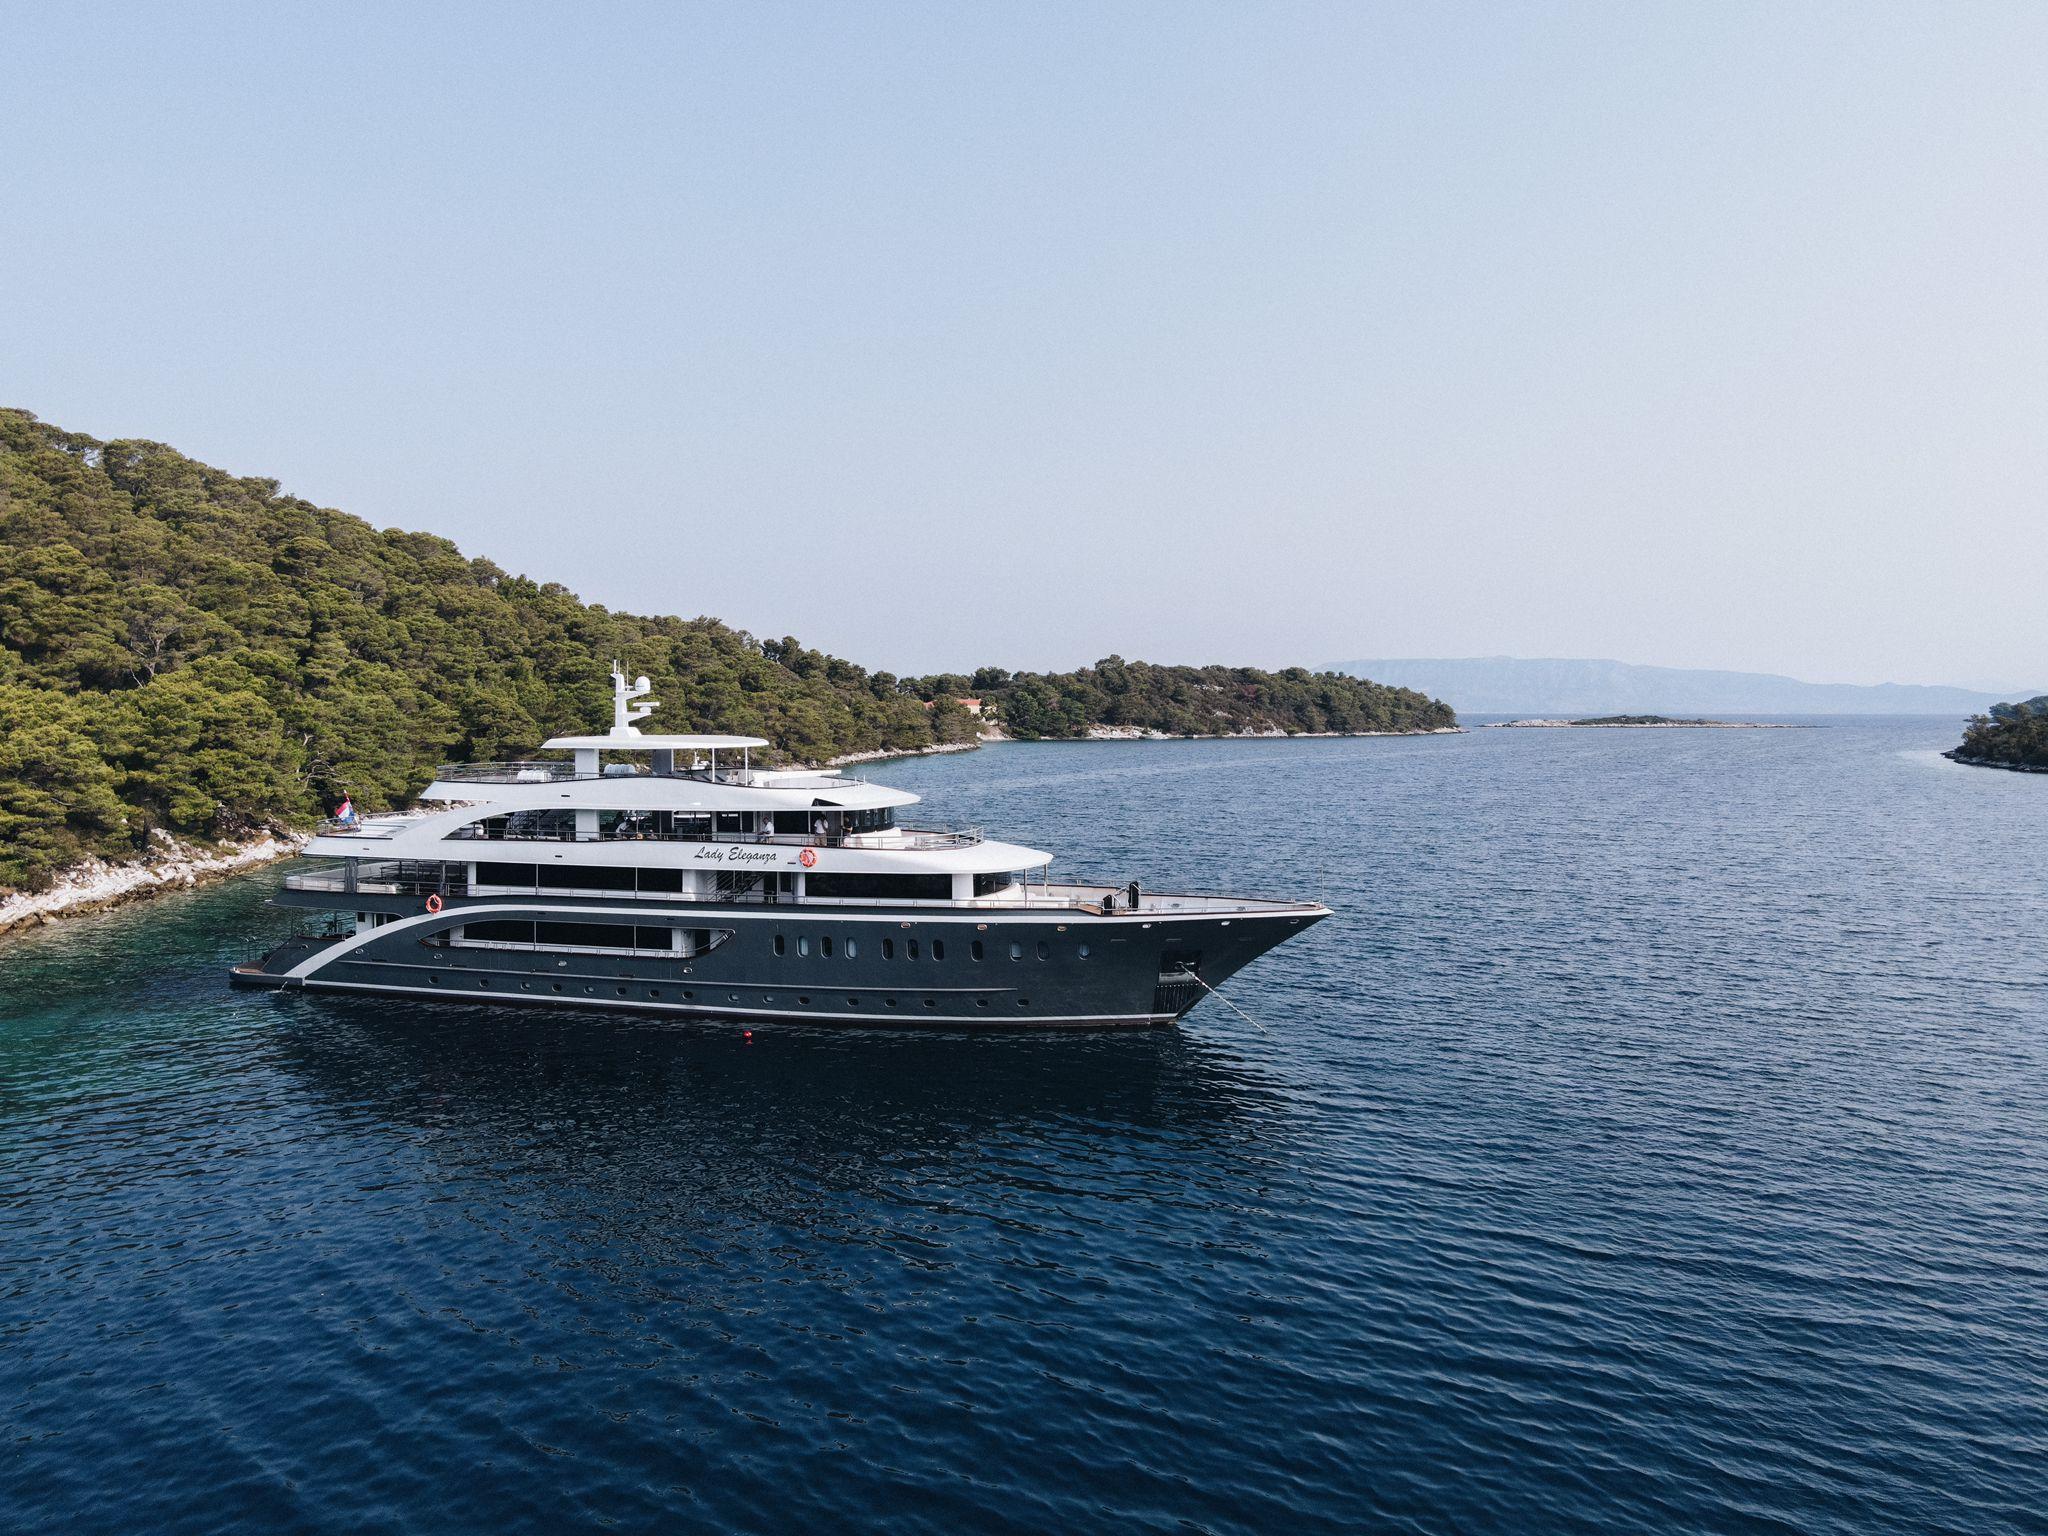 Lady-Eleganza-Yacht-For-Charter-Croatia